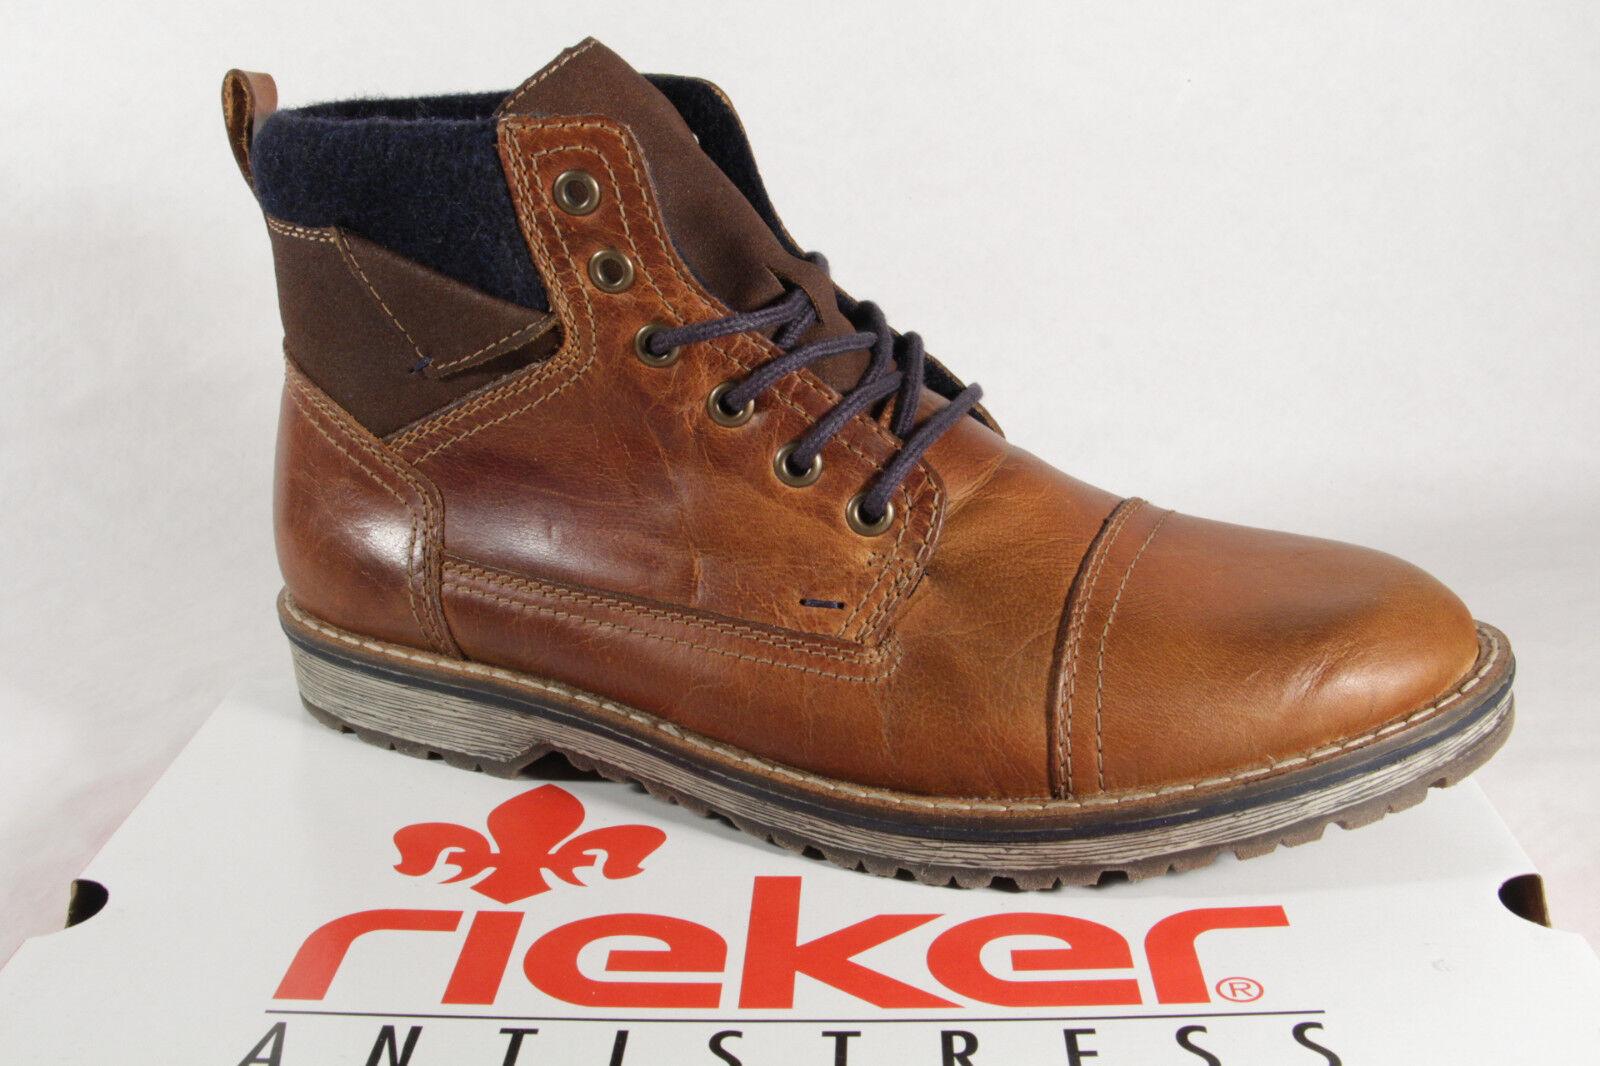 a6f3cd6d957c Robert Wayne Mens Thomas Black Ankle Casual Boots Shoes 13 Medium (D) BHFO  9348